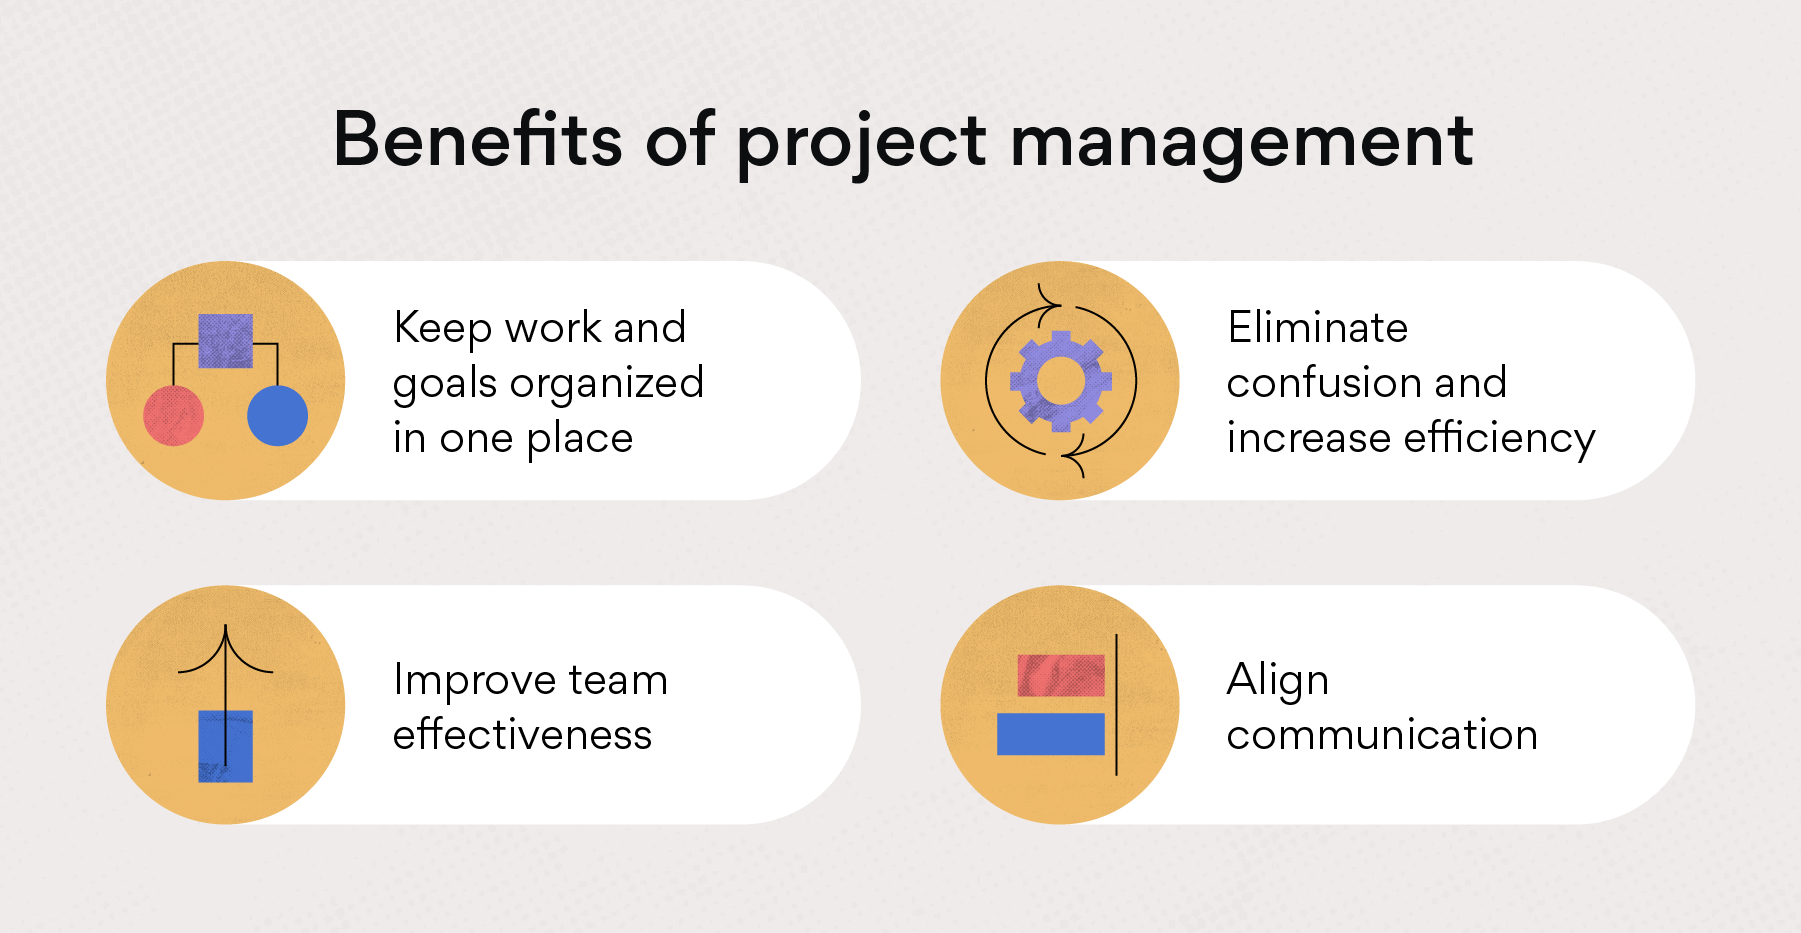 benefits of project management asana